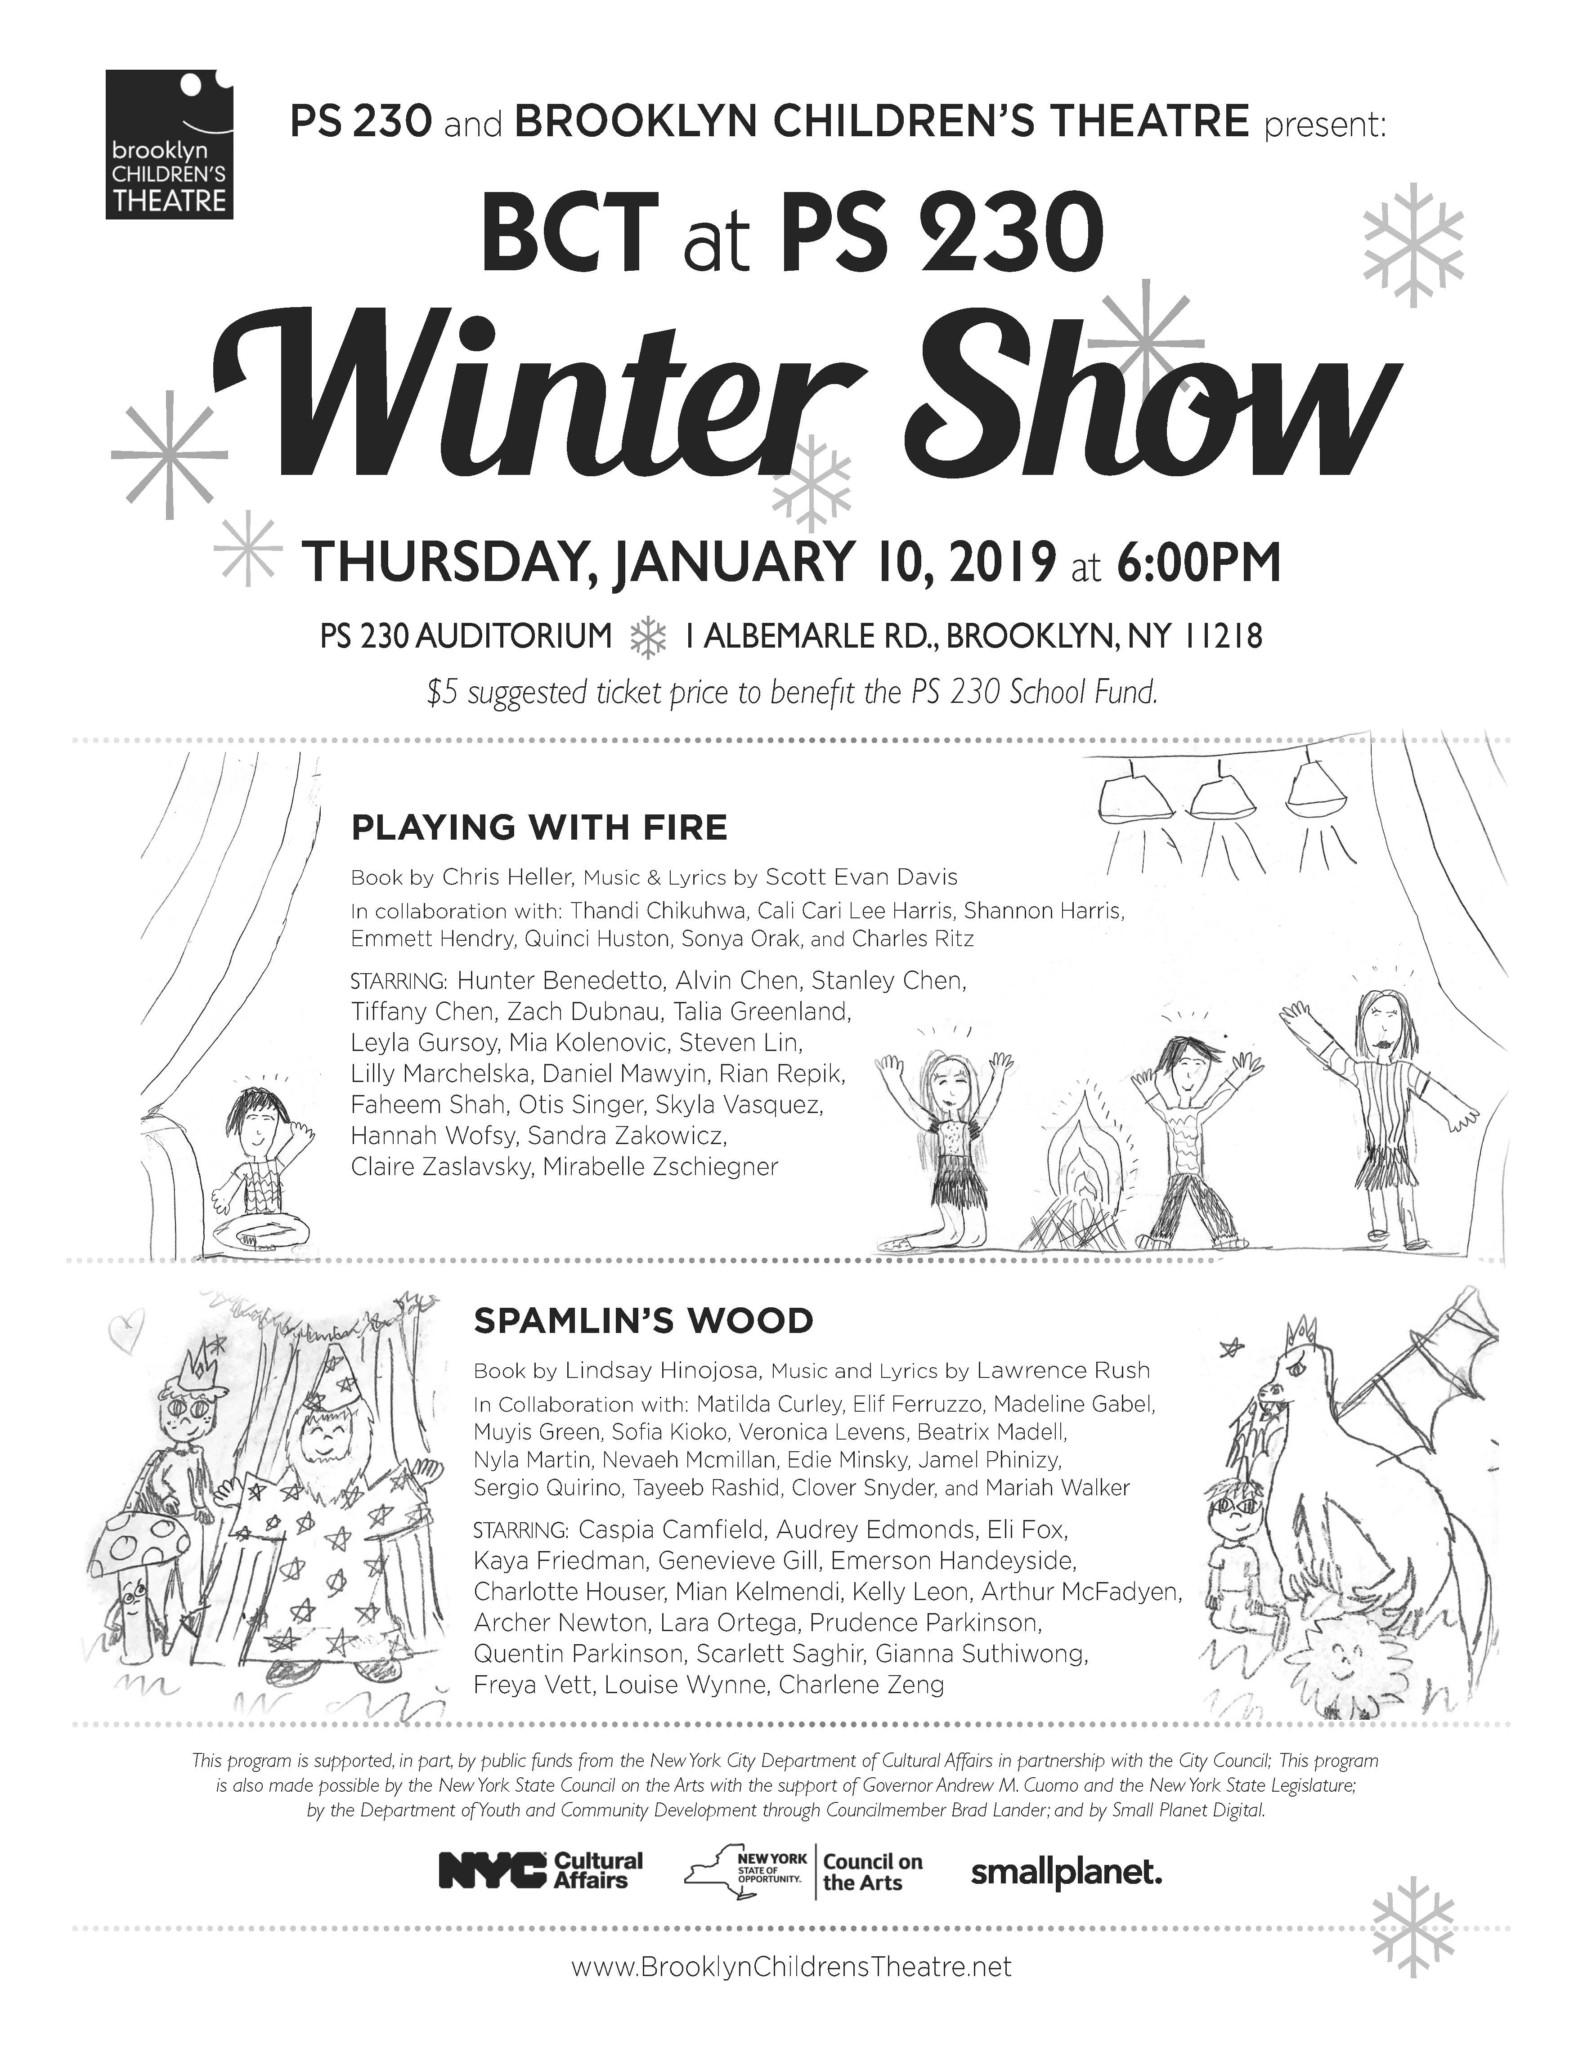 Brooklyn Children's Theatre | PS 230 Winter Shows